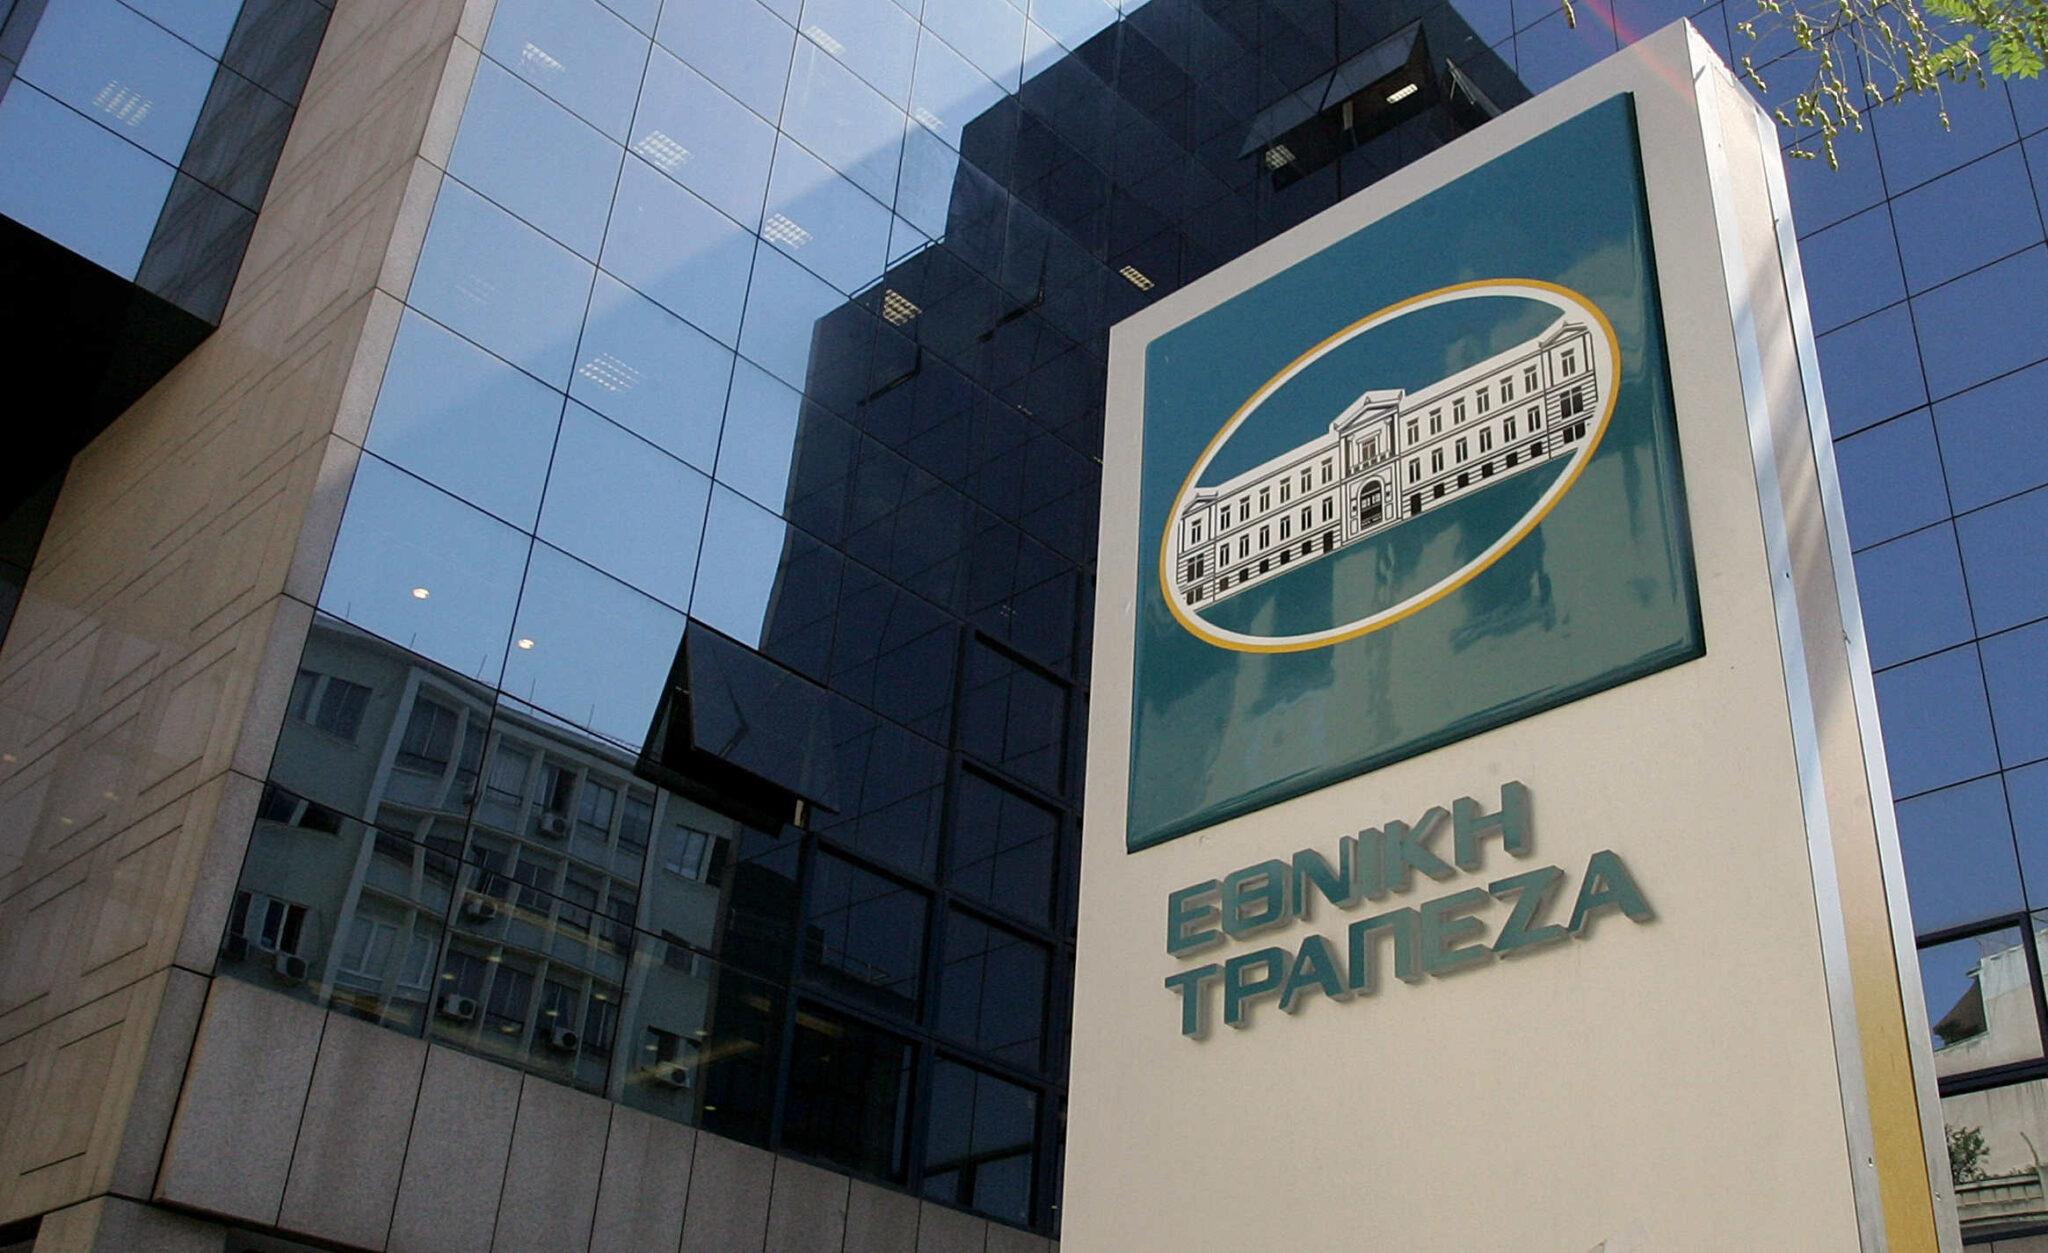 To μεγάλο βήμα της Εθνικής Τράπεζας